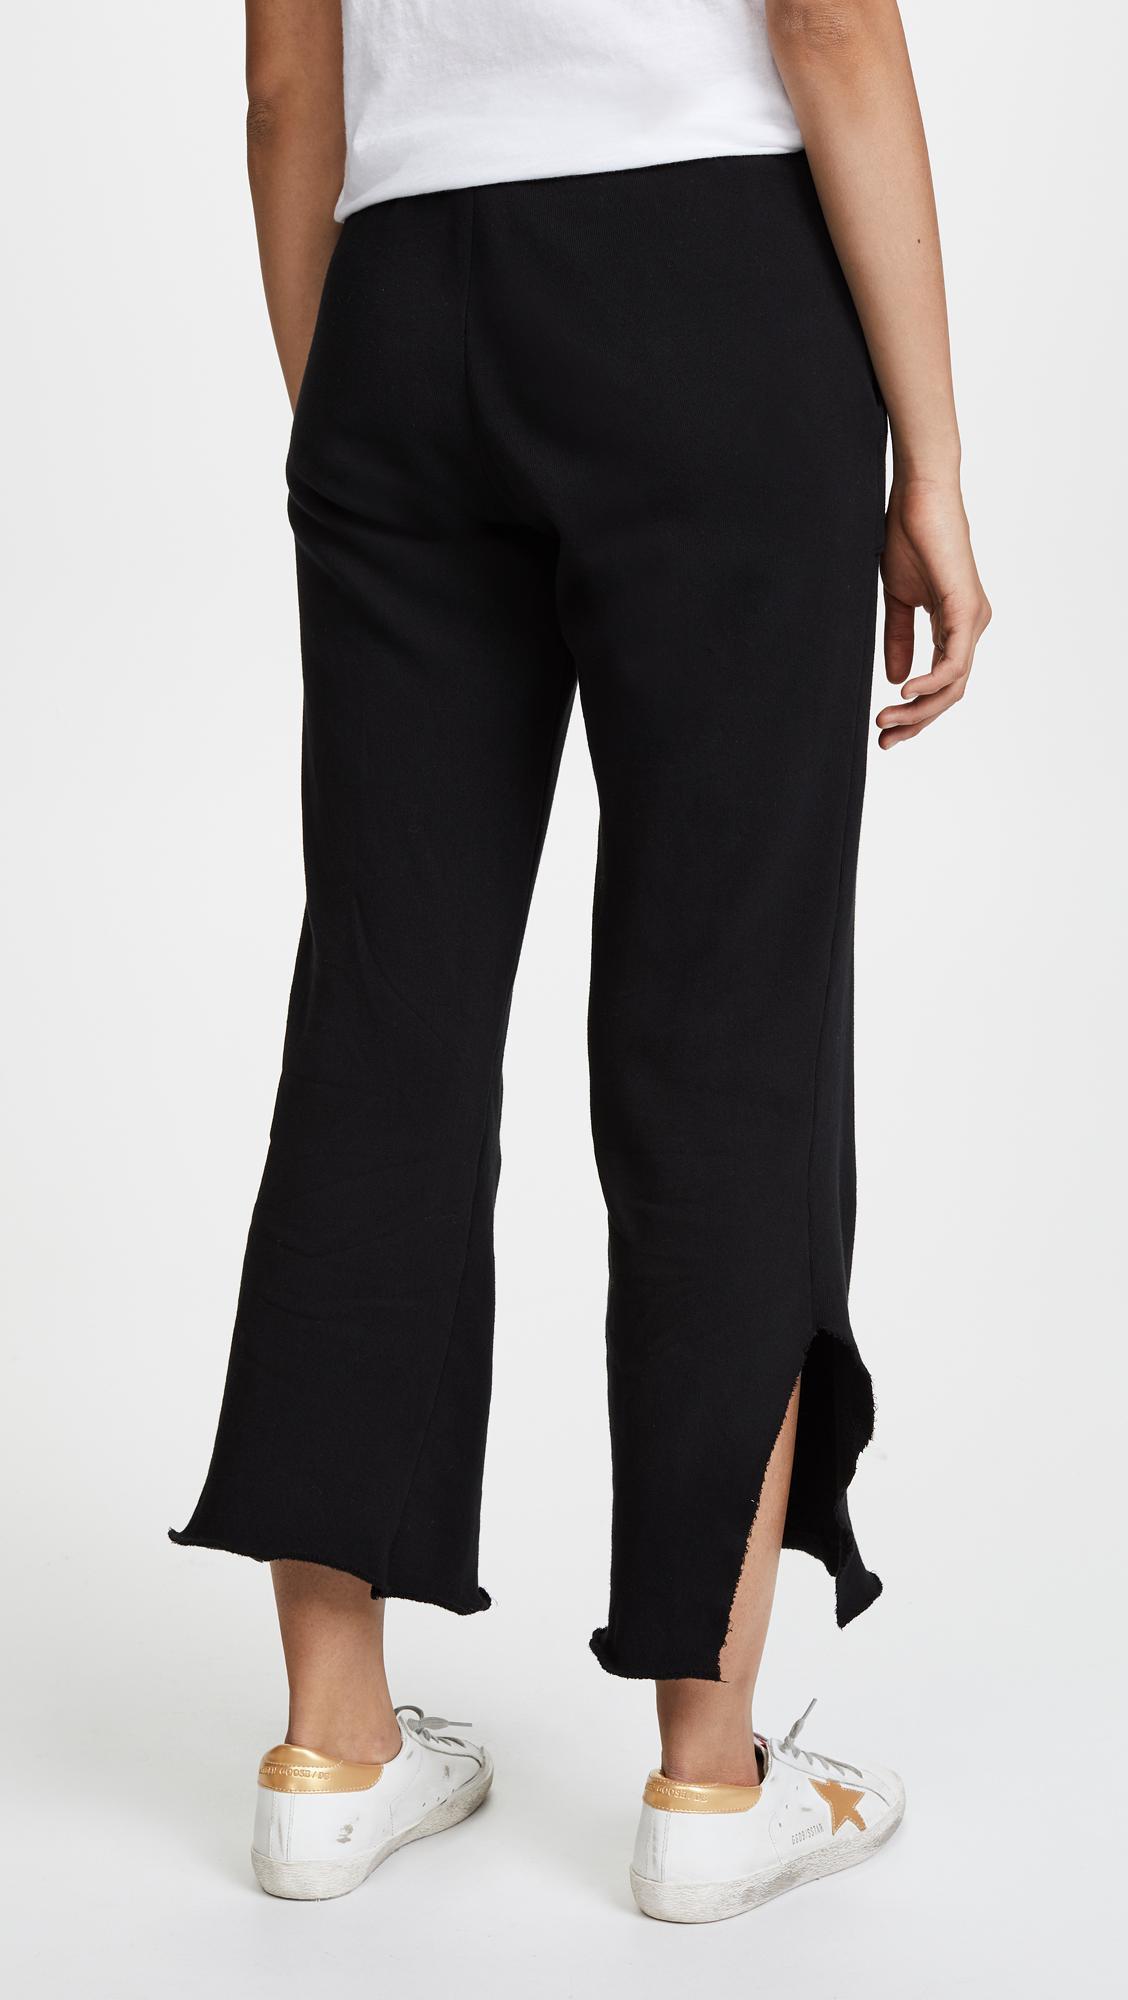 Lna Dennis Sweatpants in Black